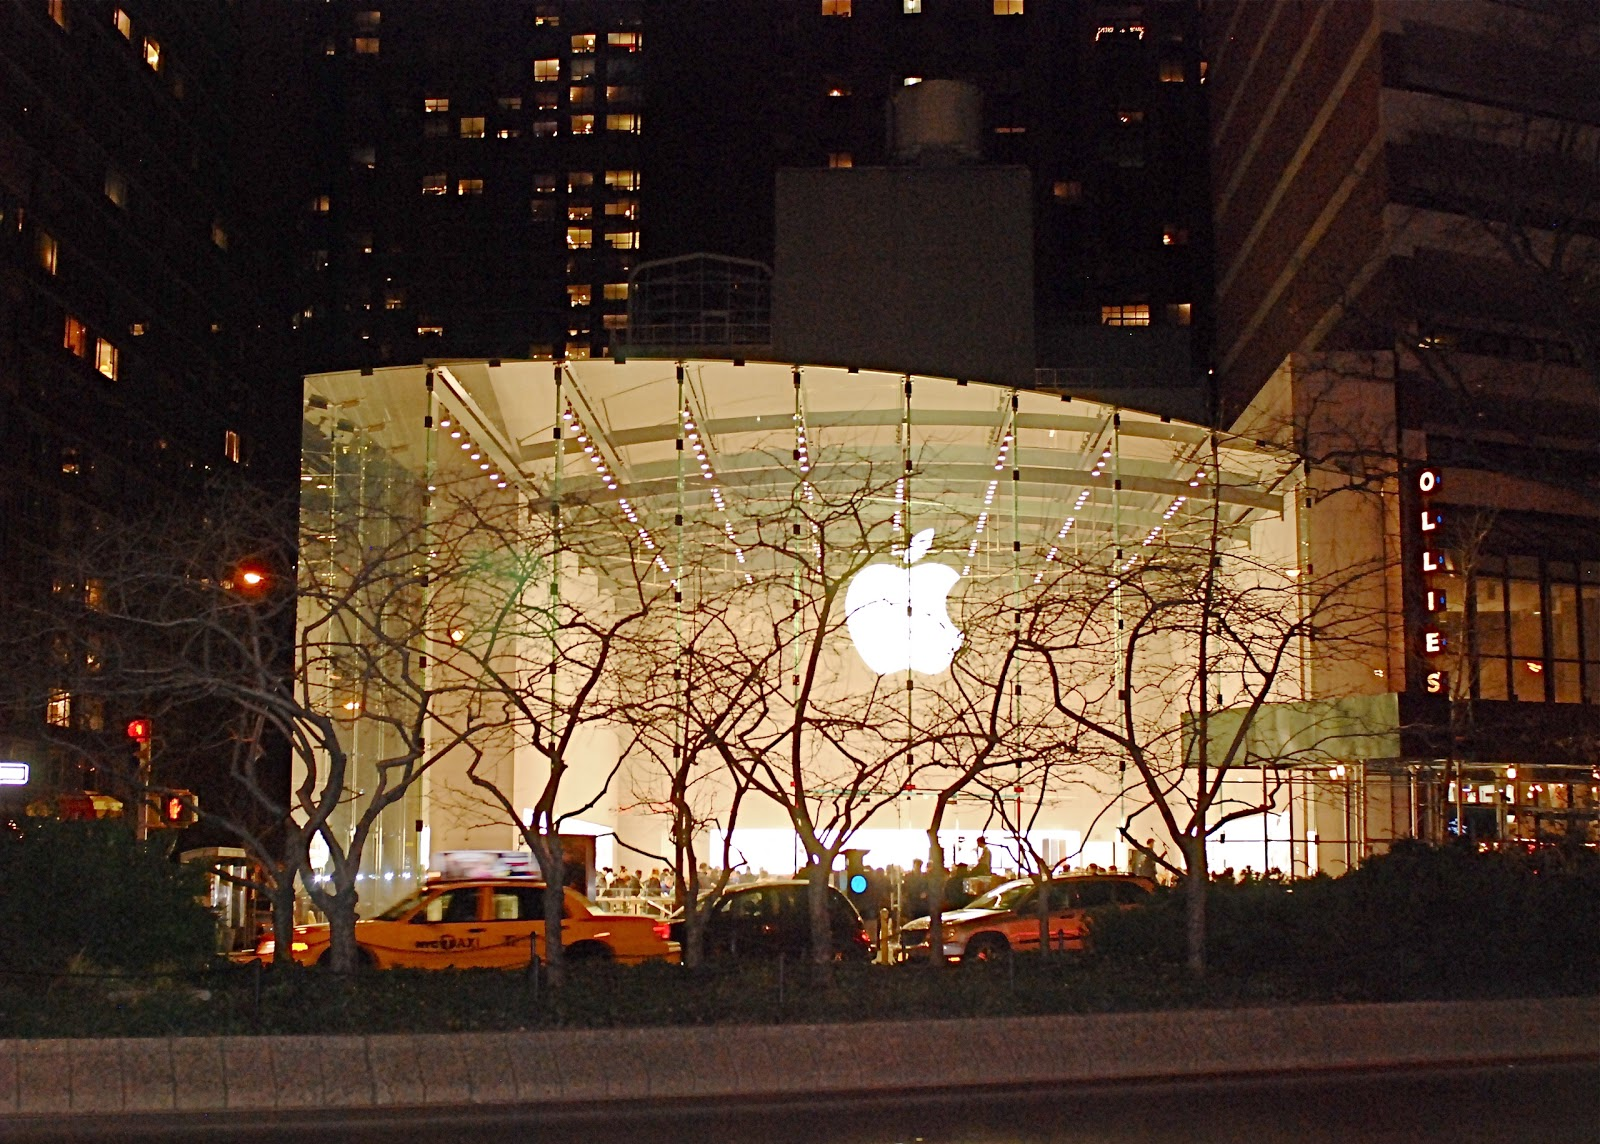 Apple store west side